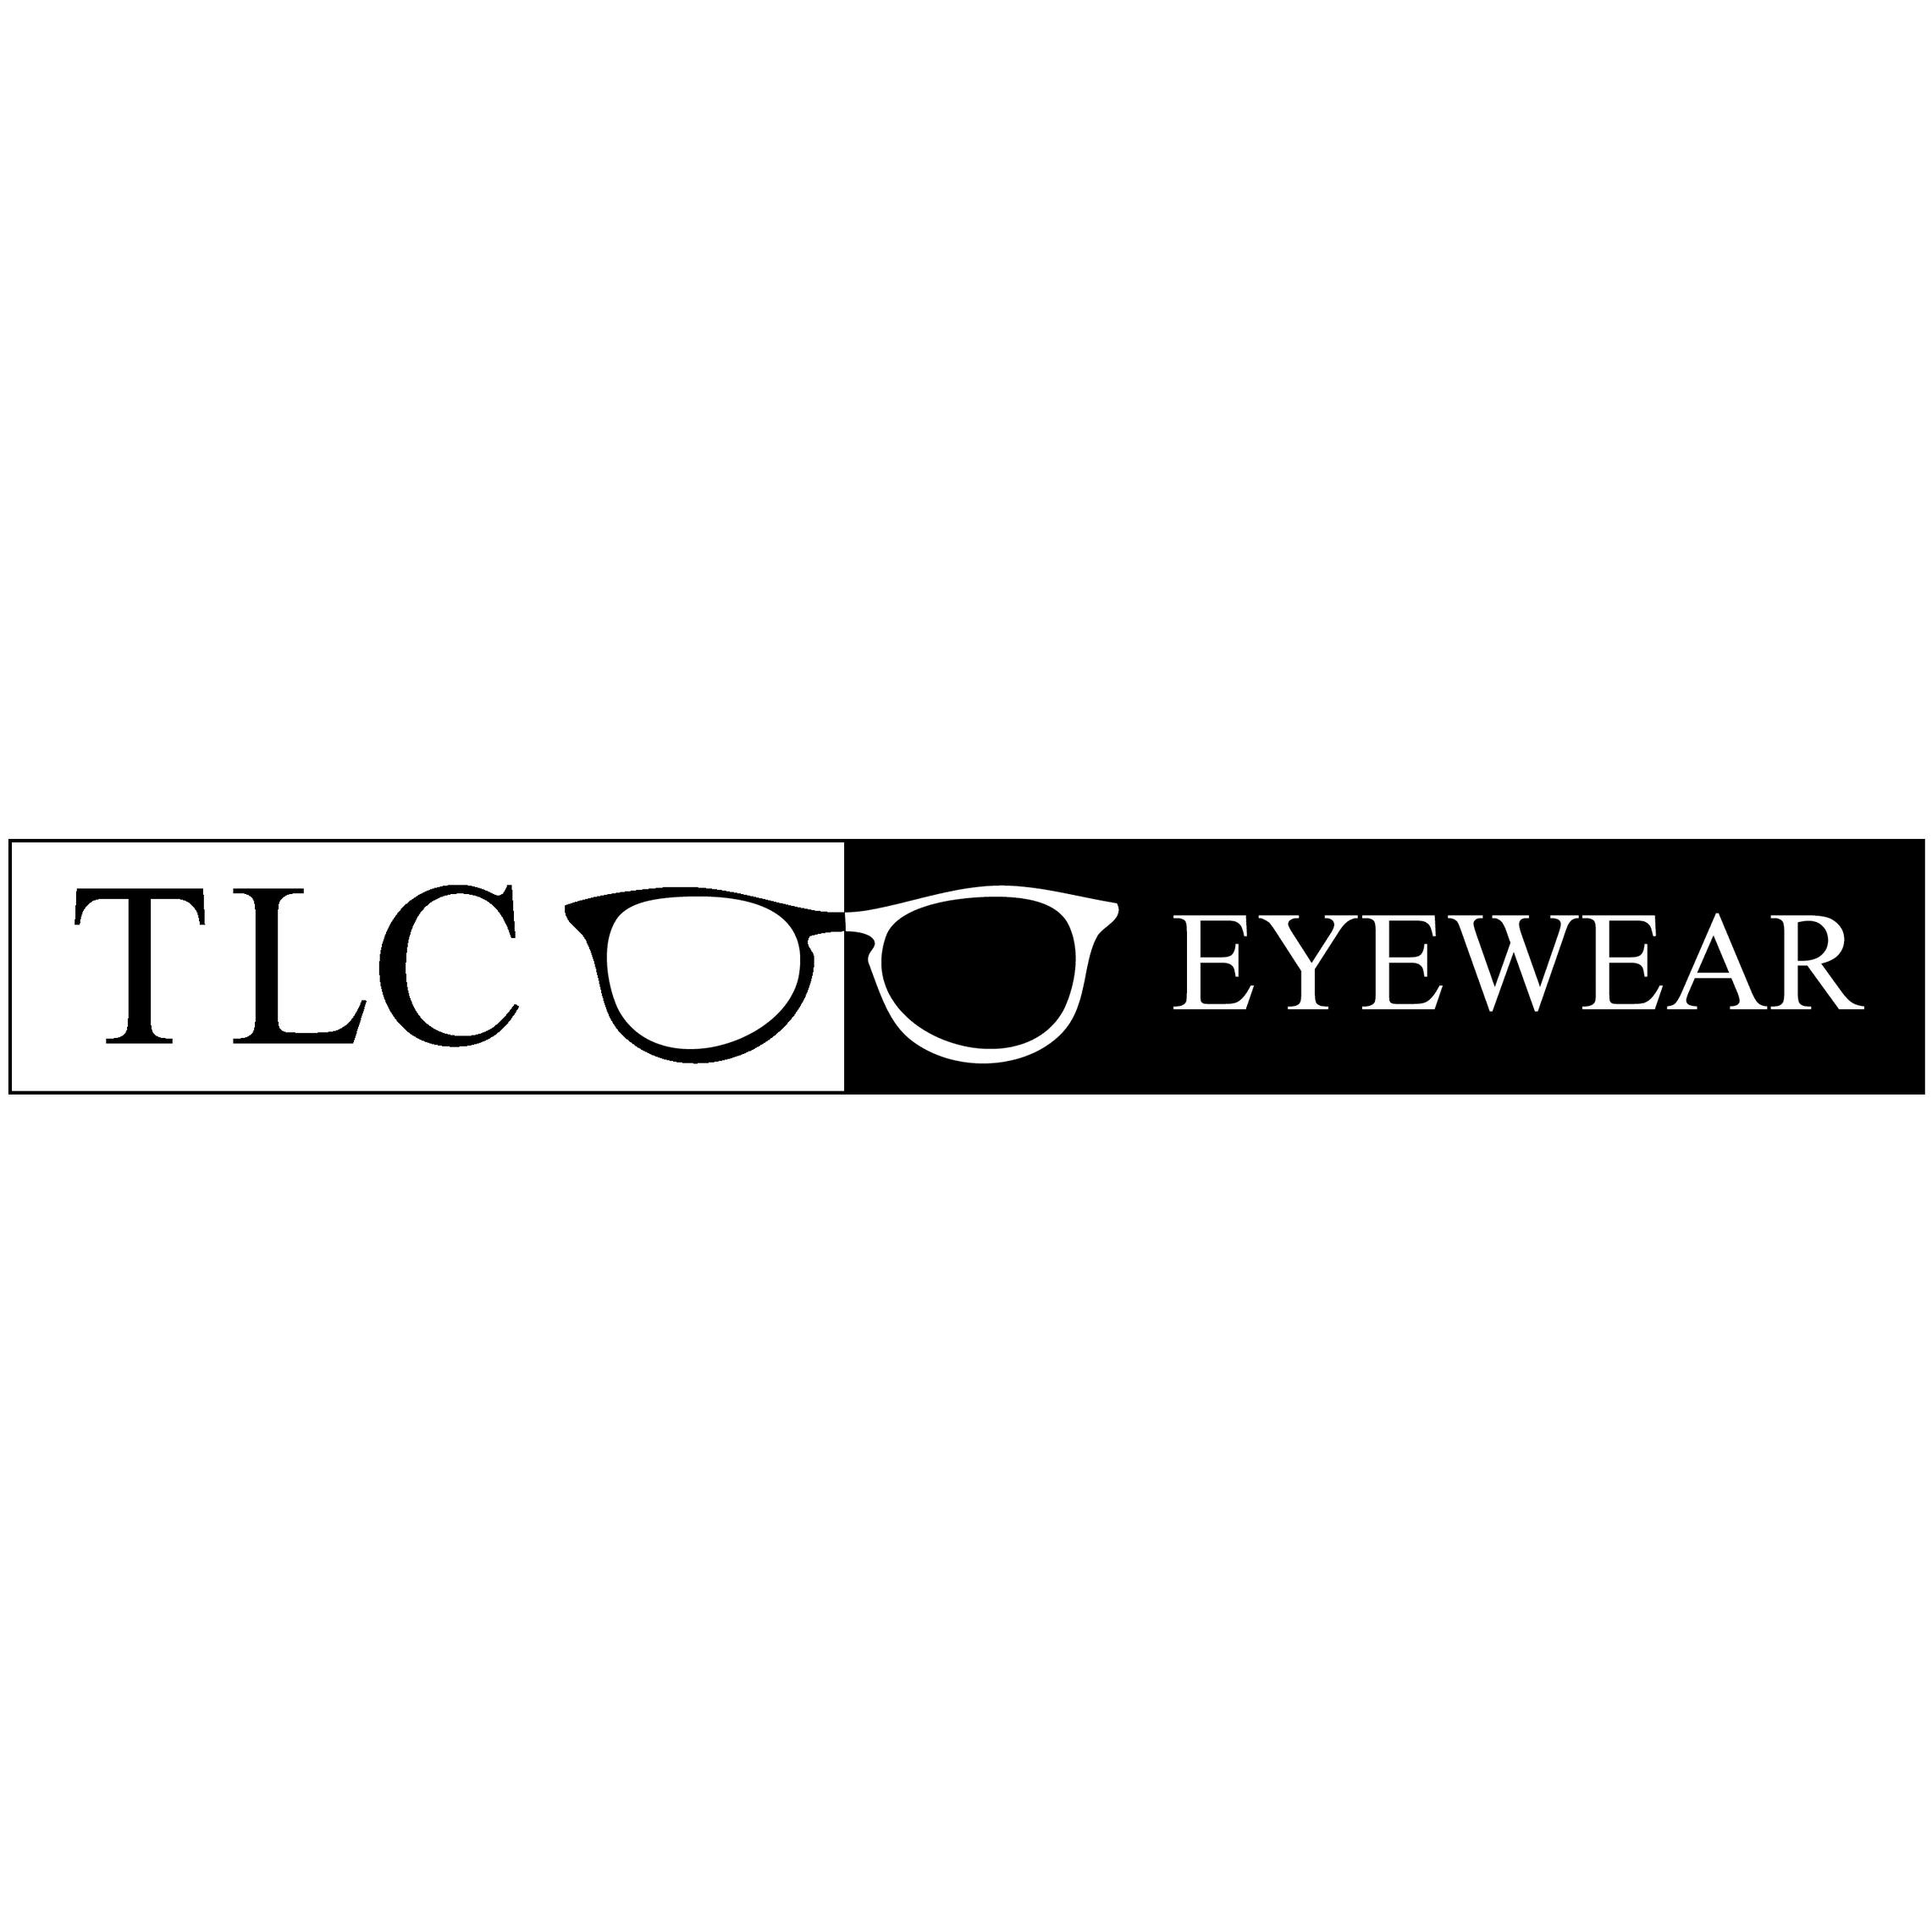 tlc eyewear canton ma business profile